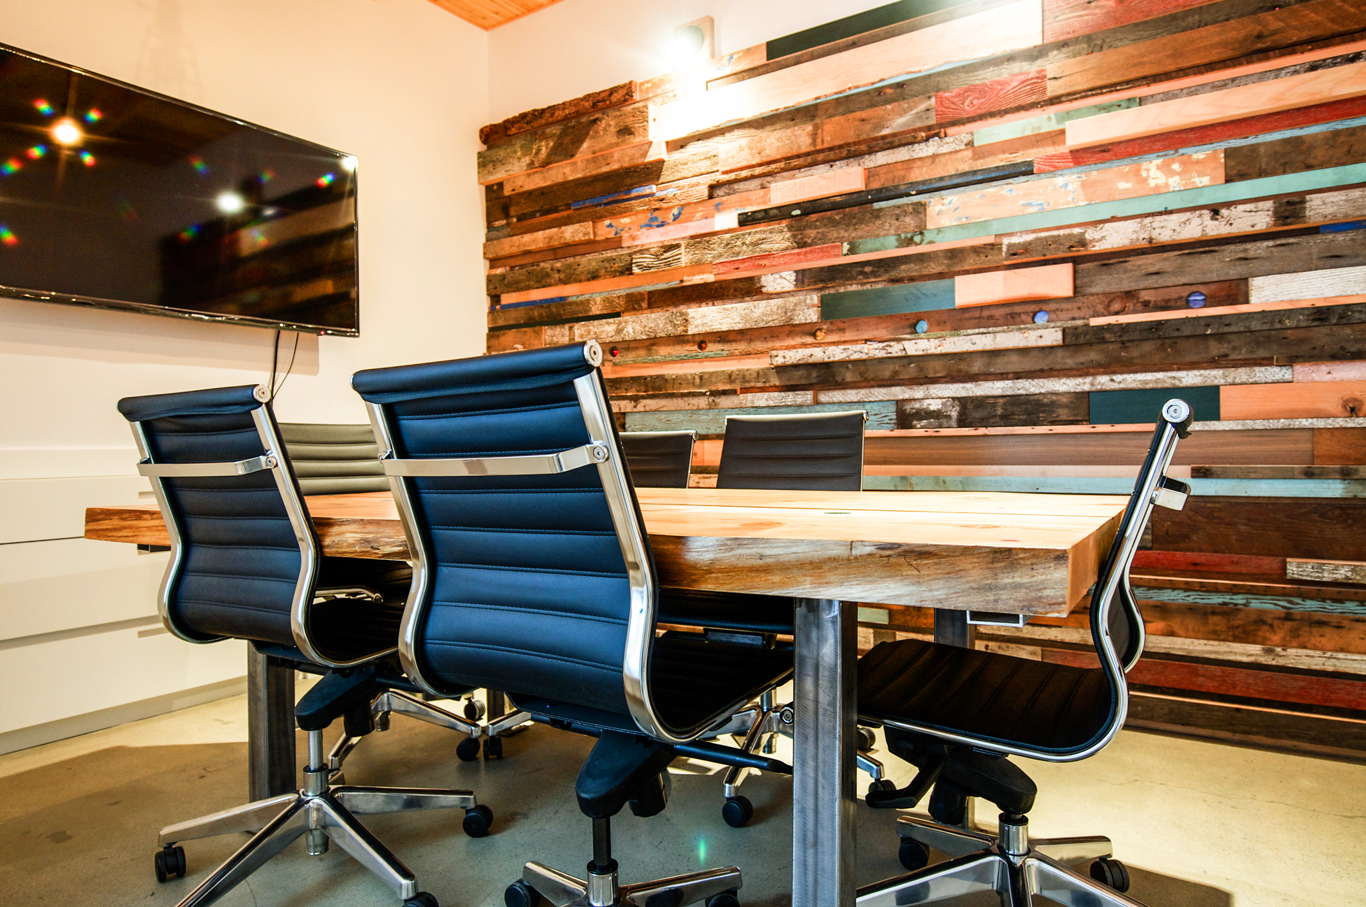 Boardroom - An upbeat, fun space. How a boardroom should look!